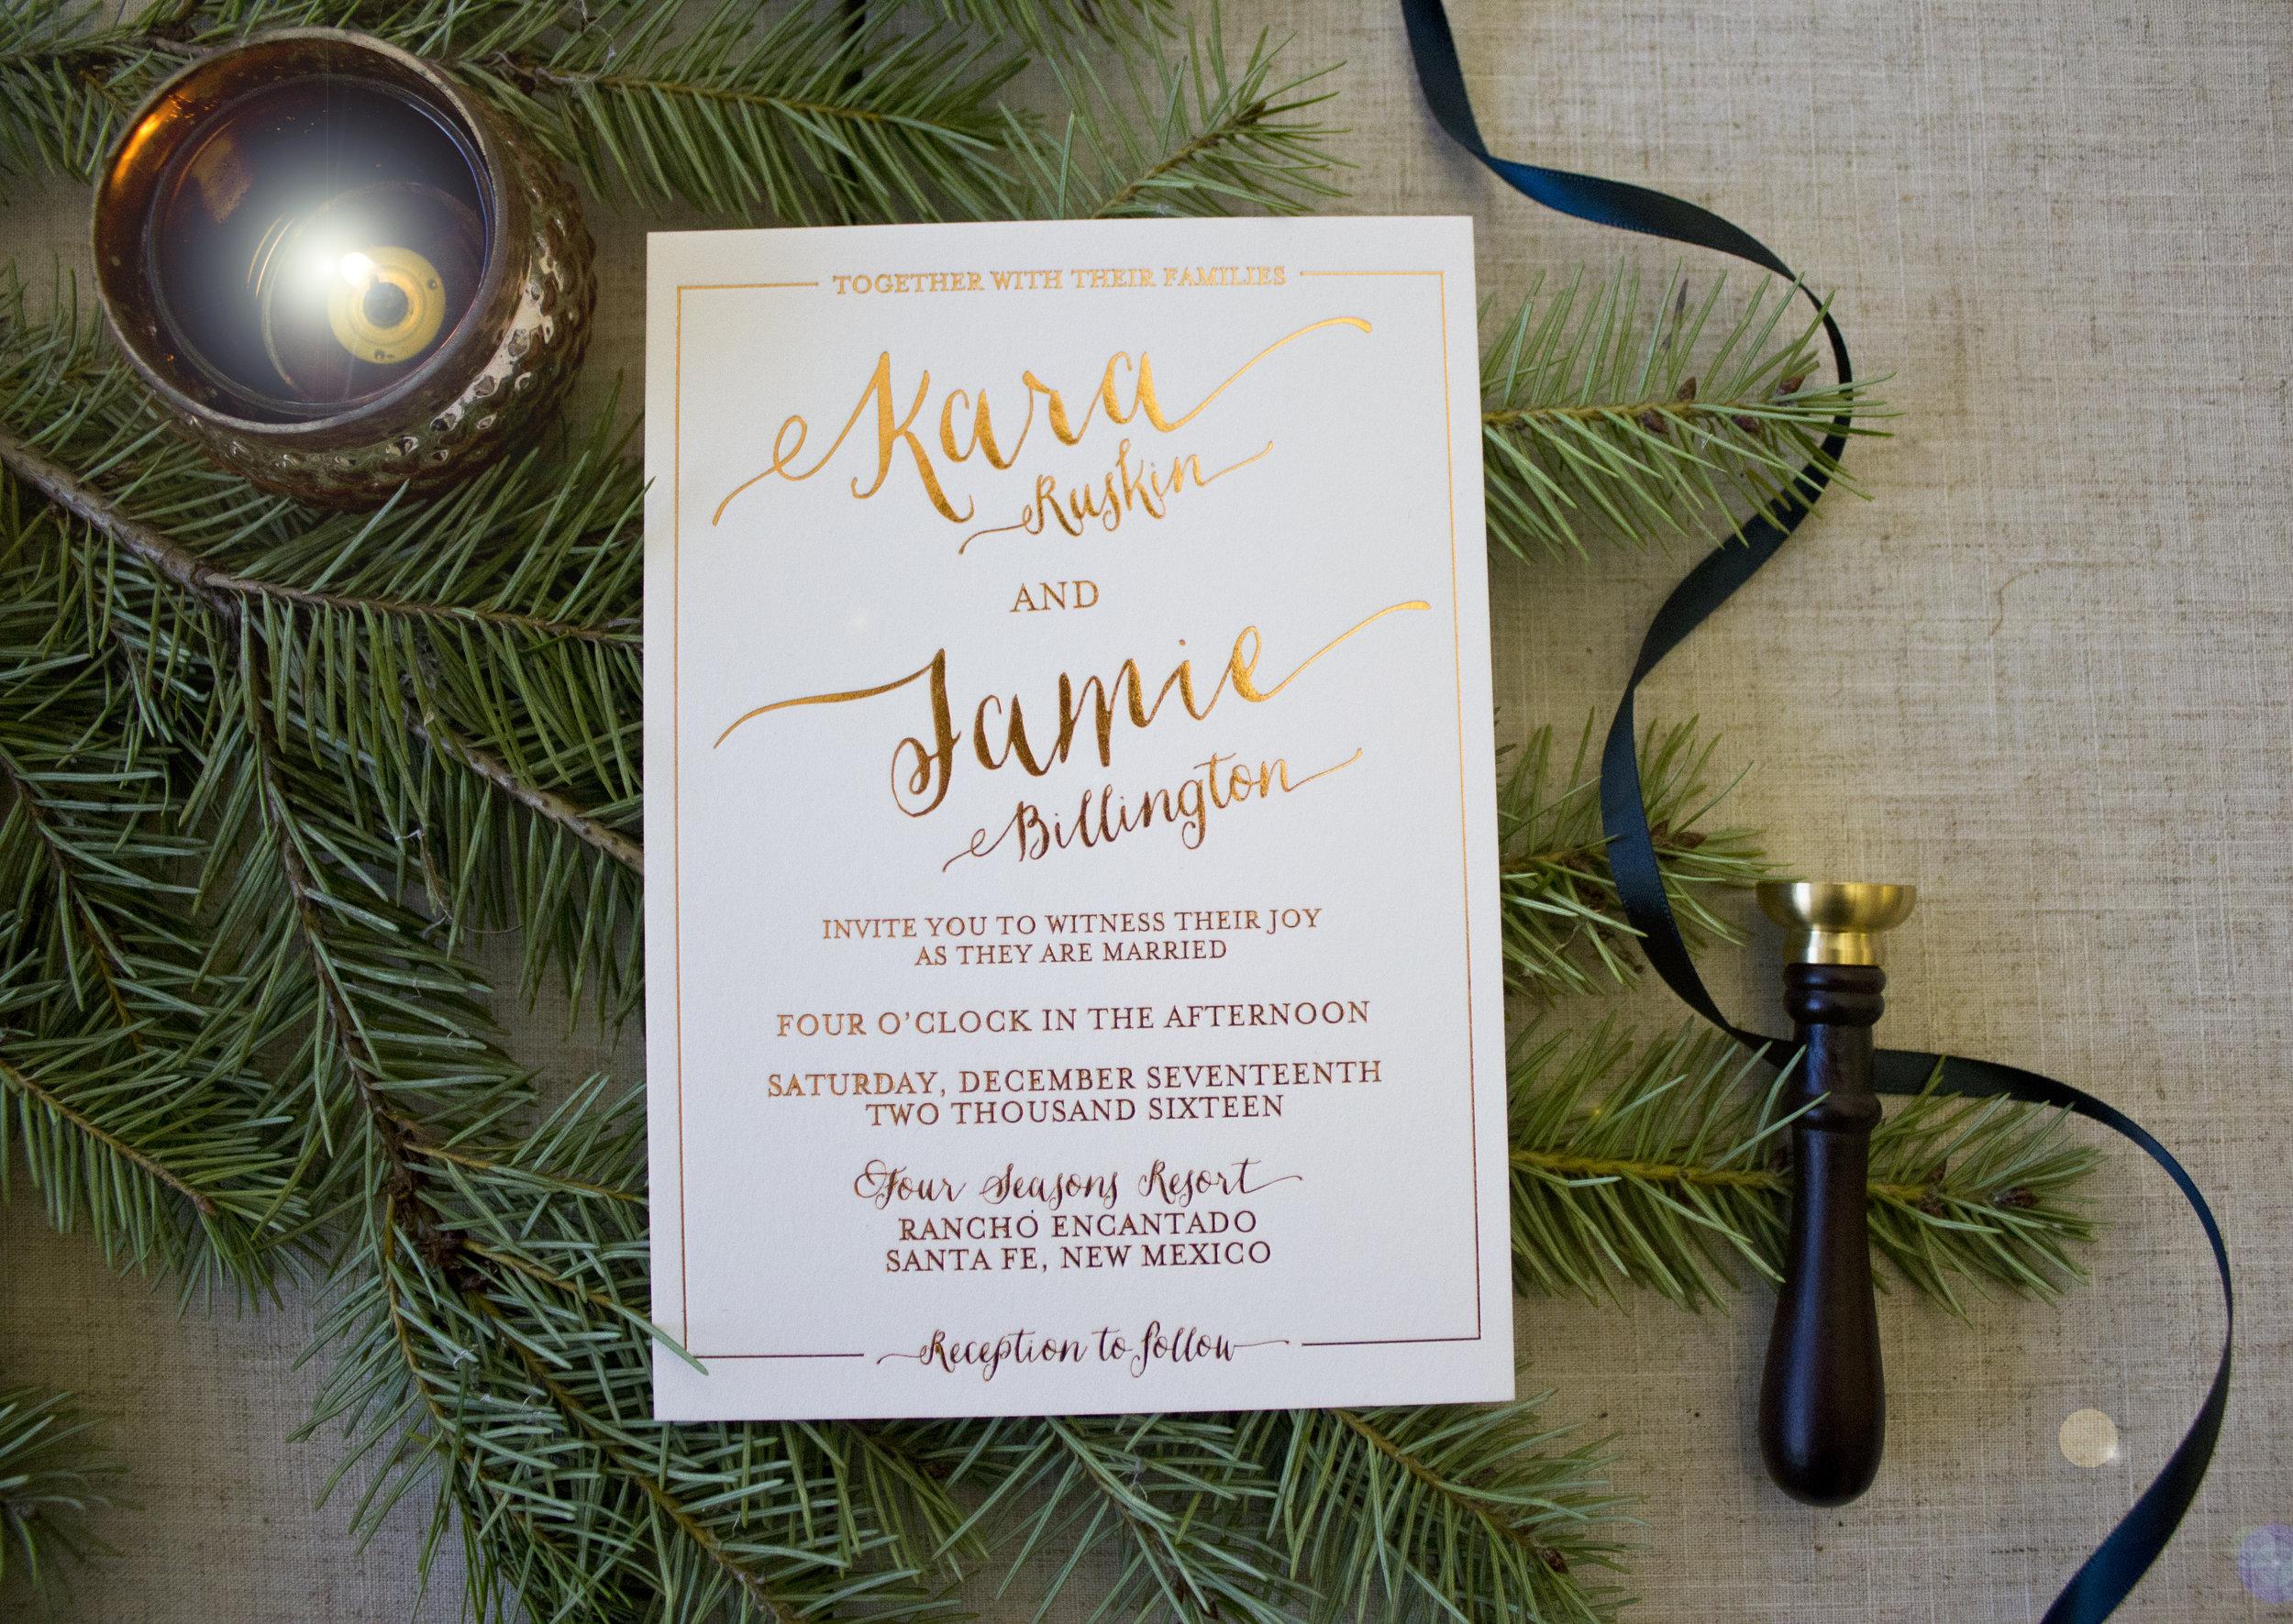 Jamie + Kara's Wedding Invitation Suite.Styling + Photo © Funky Olive Invitations + Stationery 2017